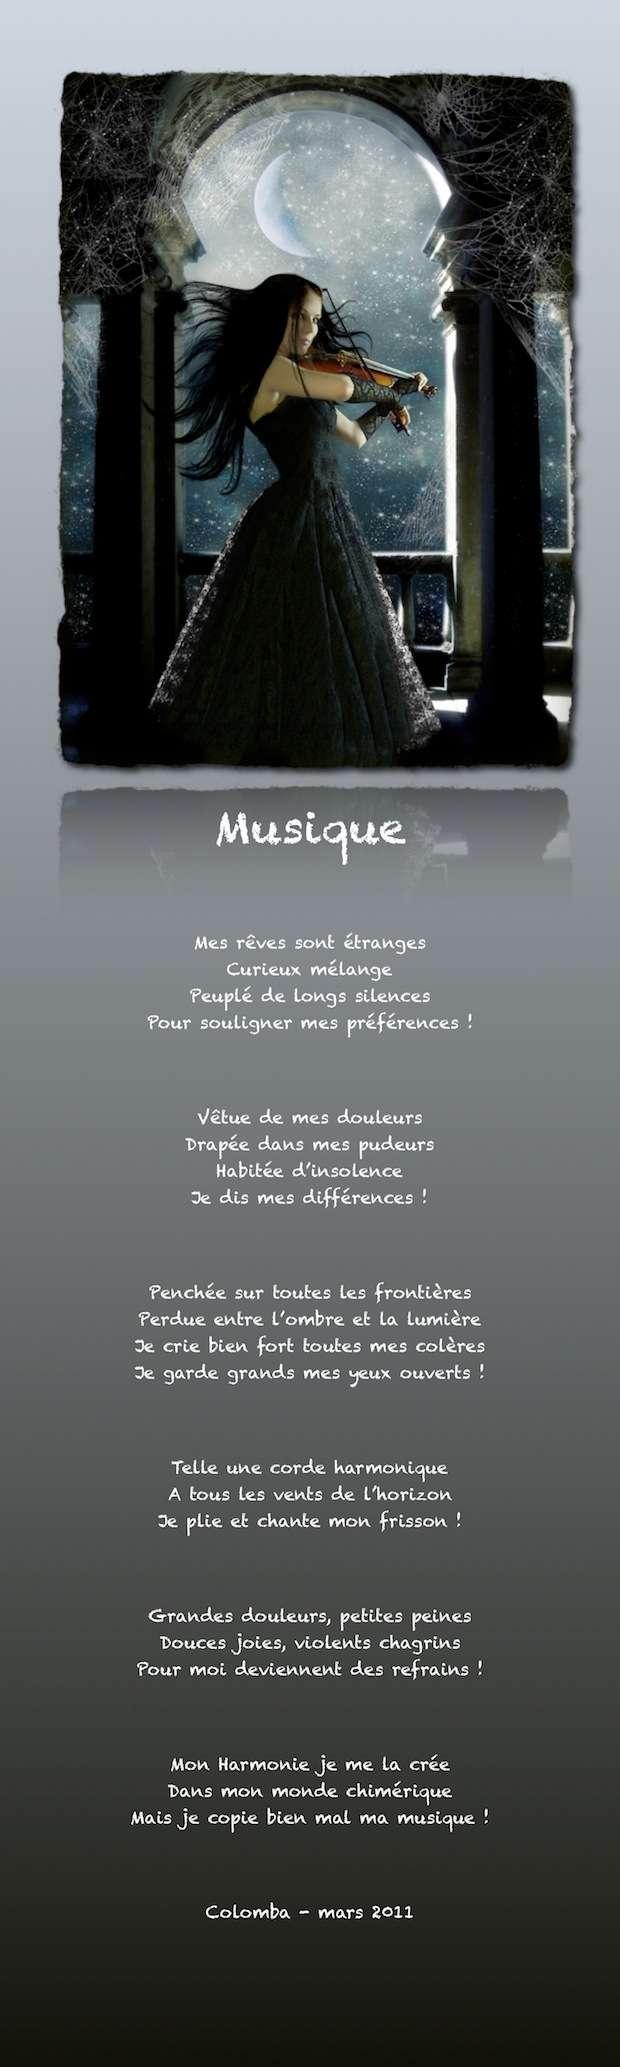 http://img195.imageshack.us/img195/6821/musiqueparcolomba.jpg